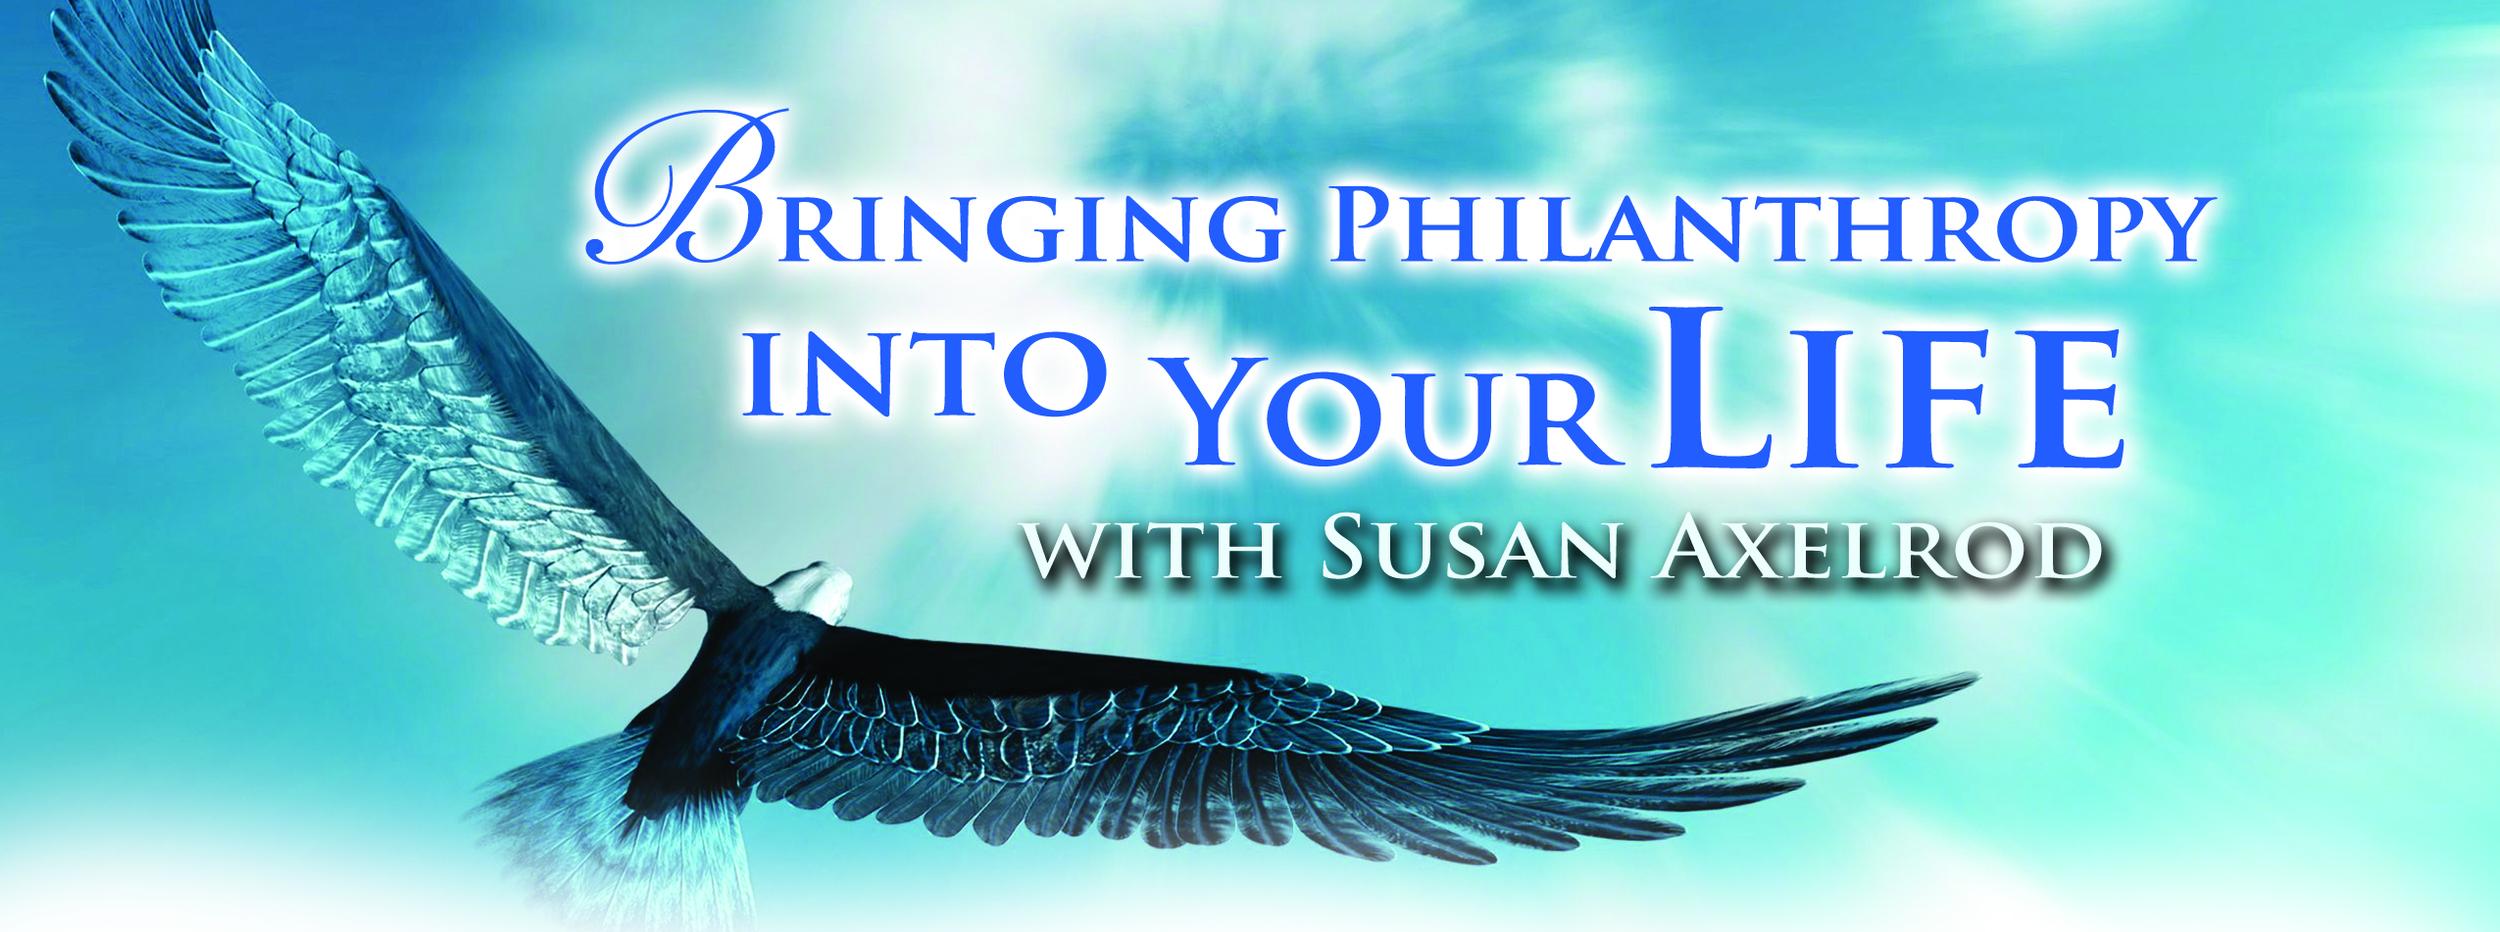 Susan Axelrod Philanthropy HEADER (1).jpg